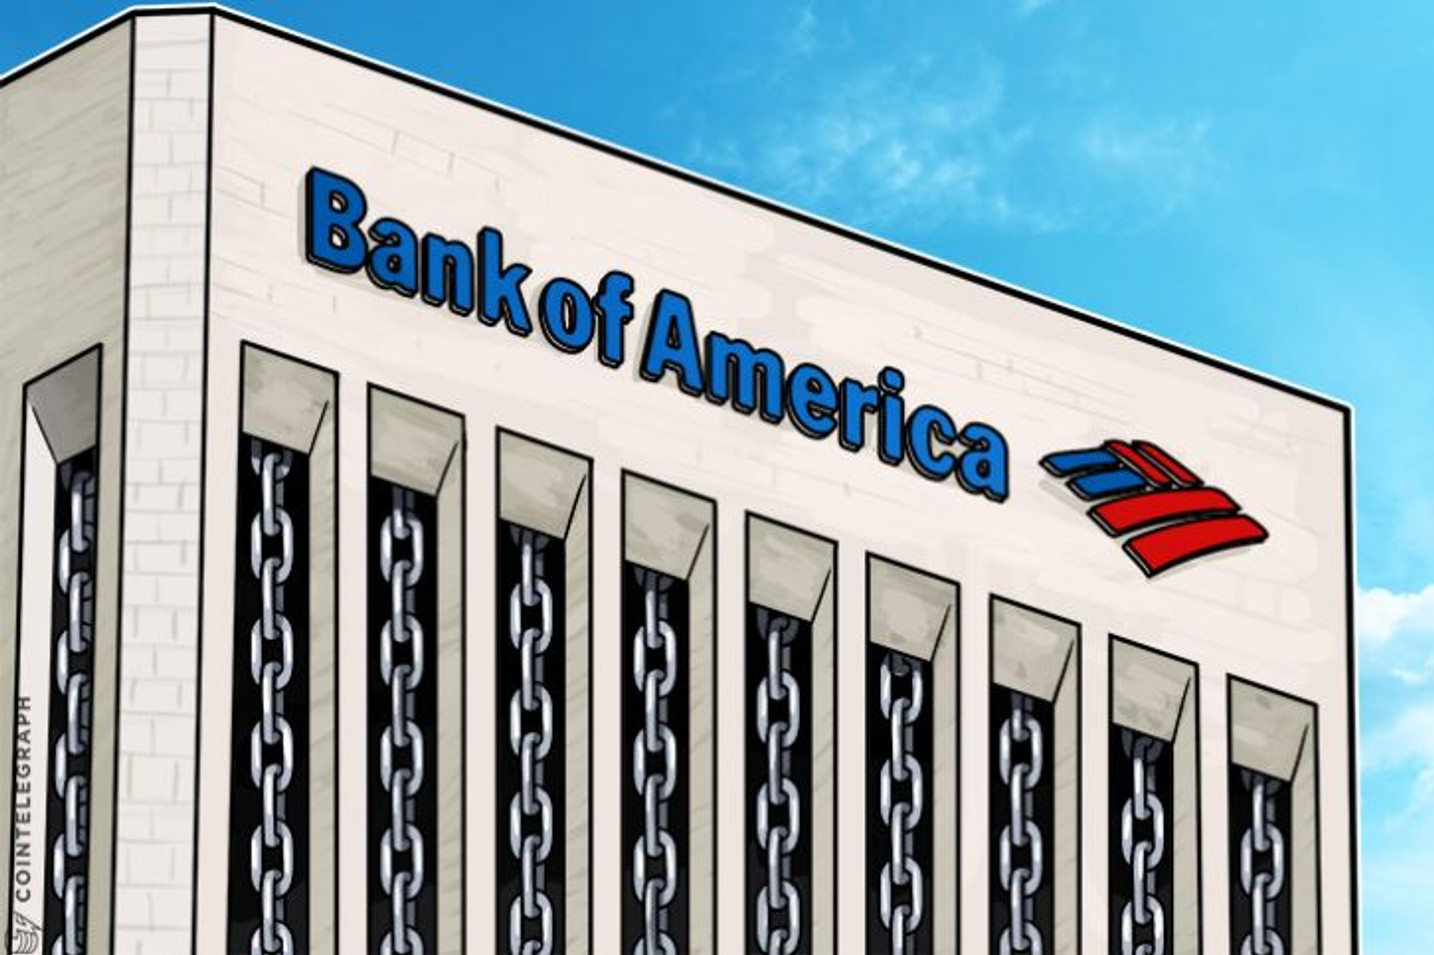 USPTO concede patente de sistema de câmbio de criptomoeda ao Bank of America